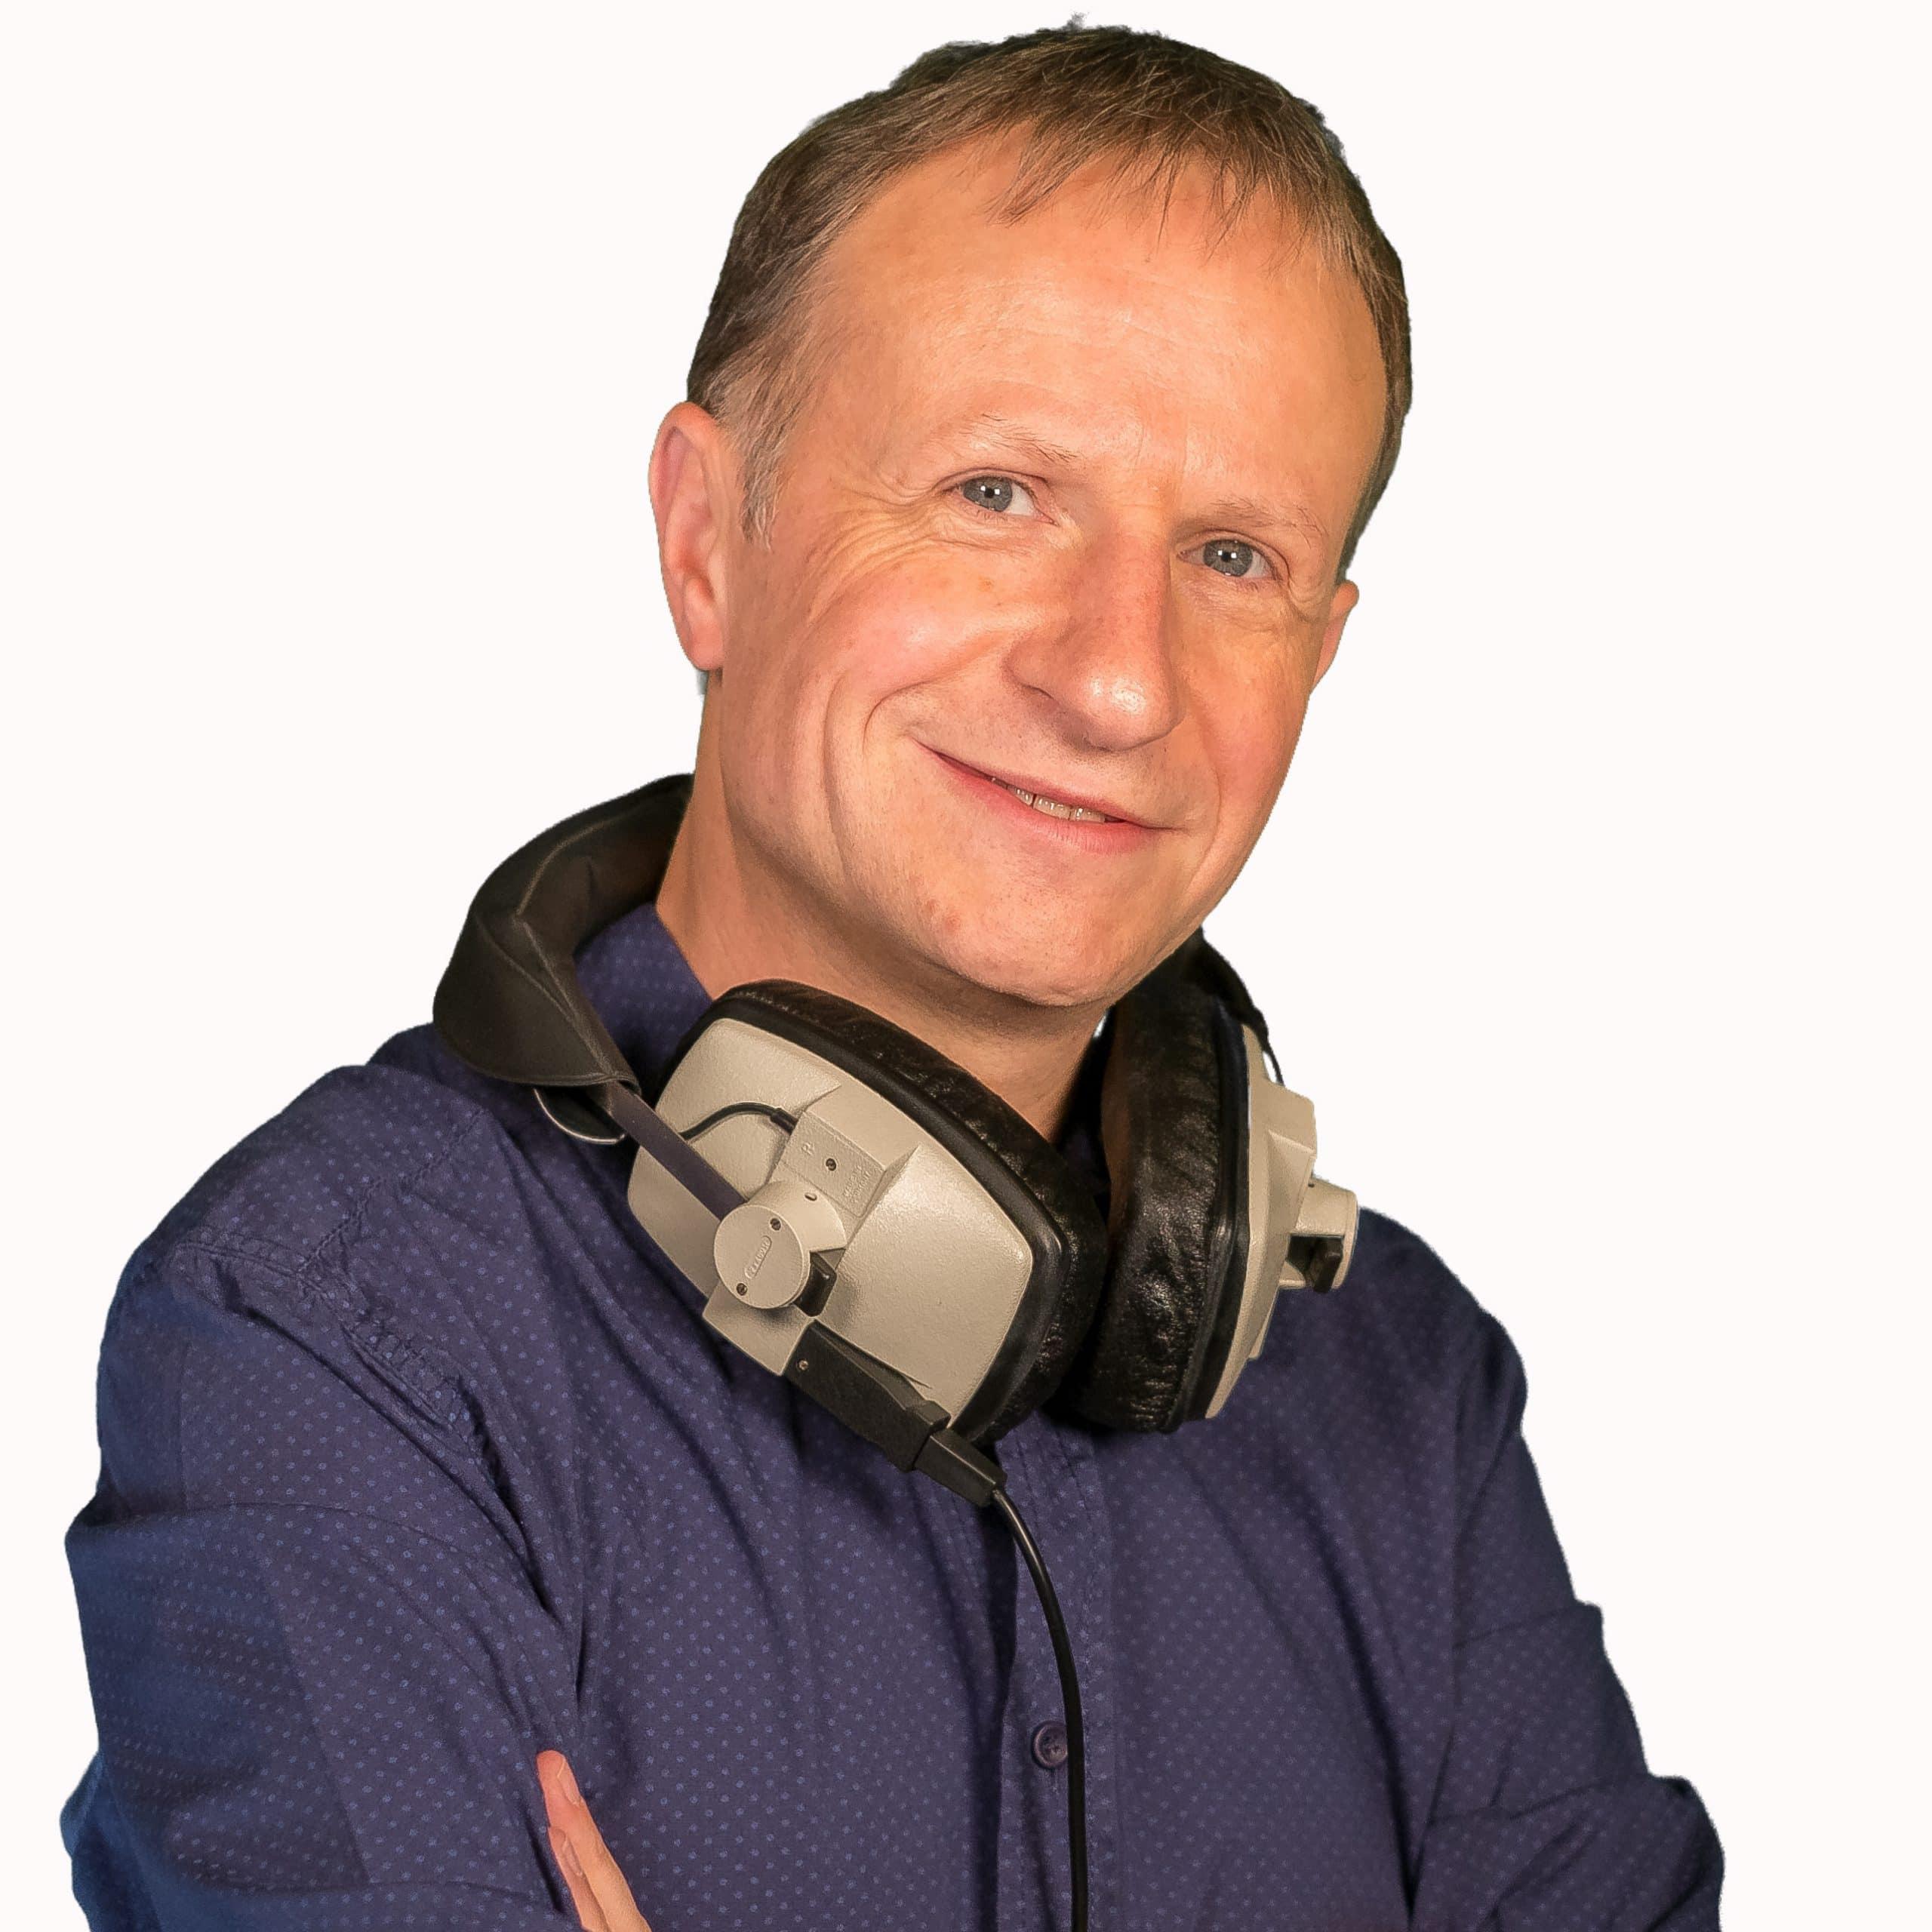 makr-r-british-broadcaster-voiceover-artist